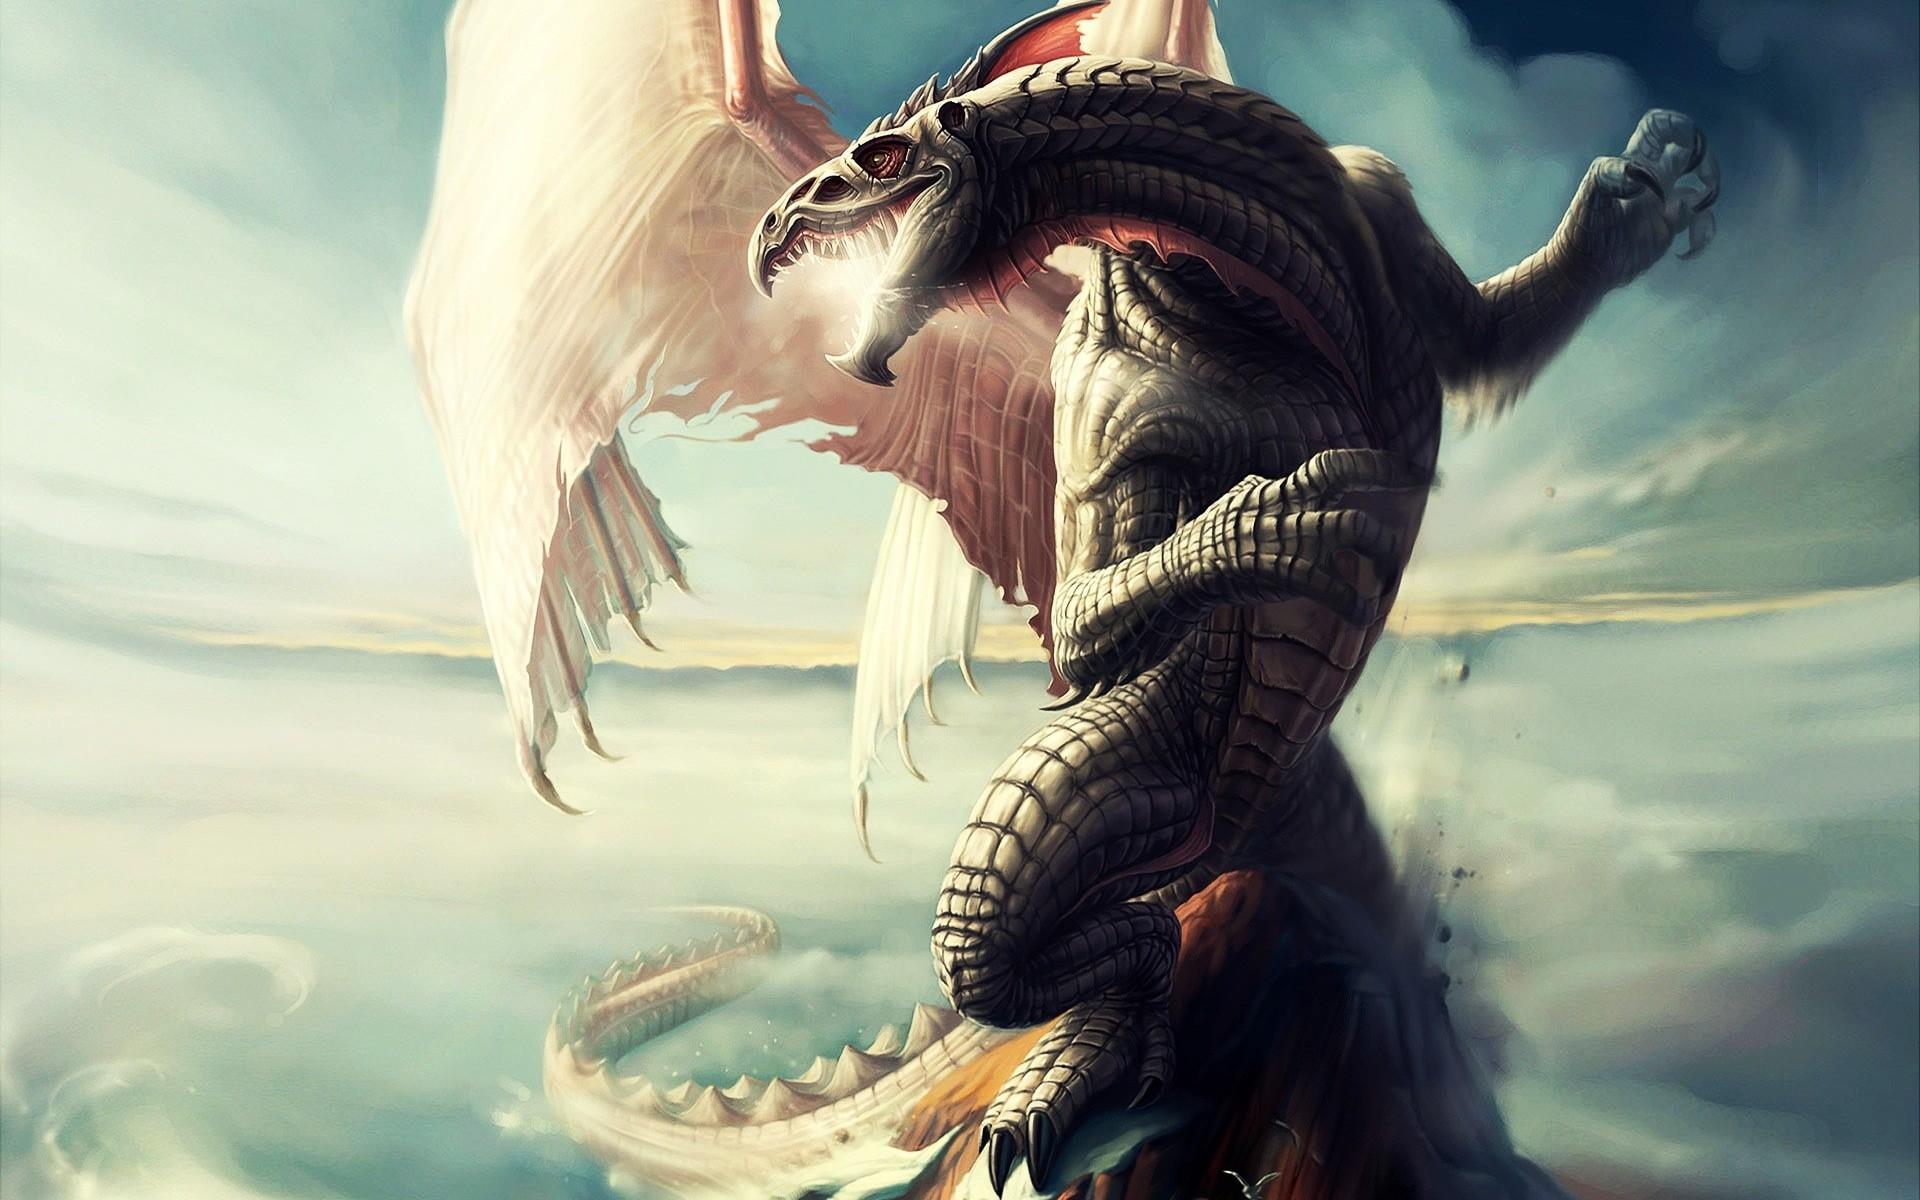 Japanese Hiccup Dragon Wallpaper · Amaing Dragon